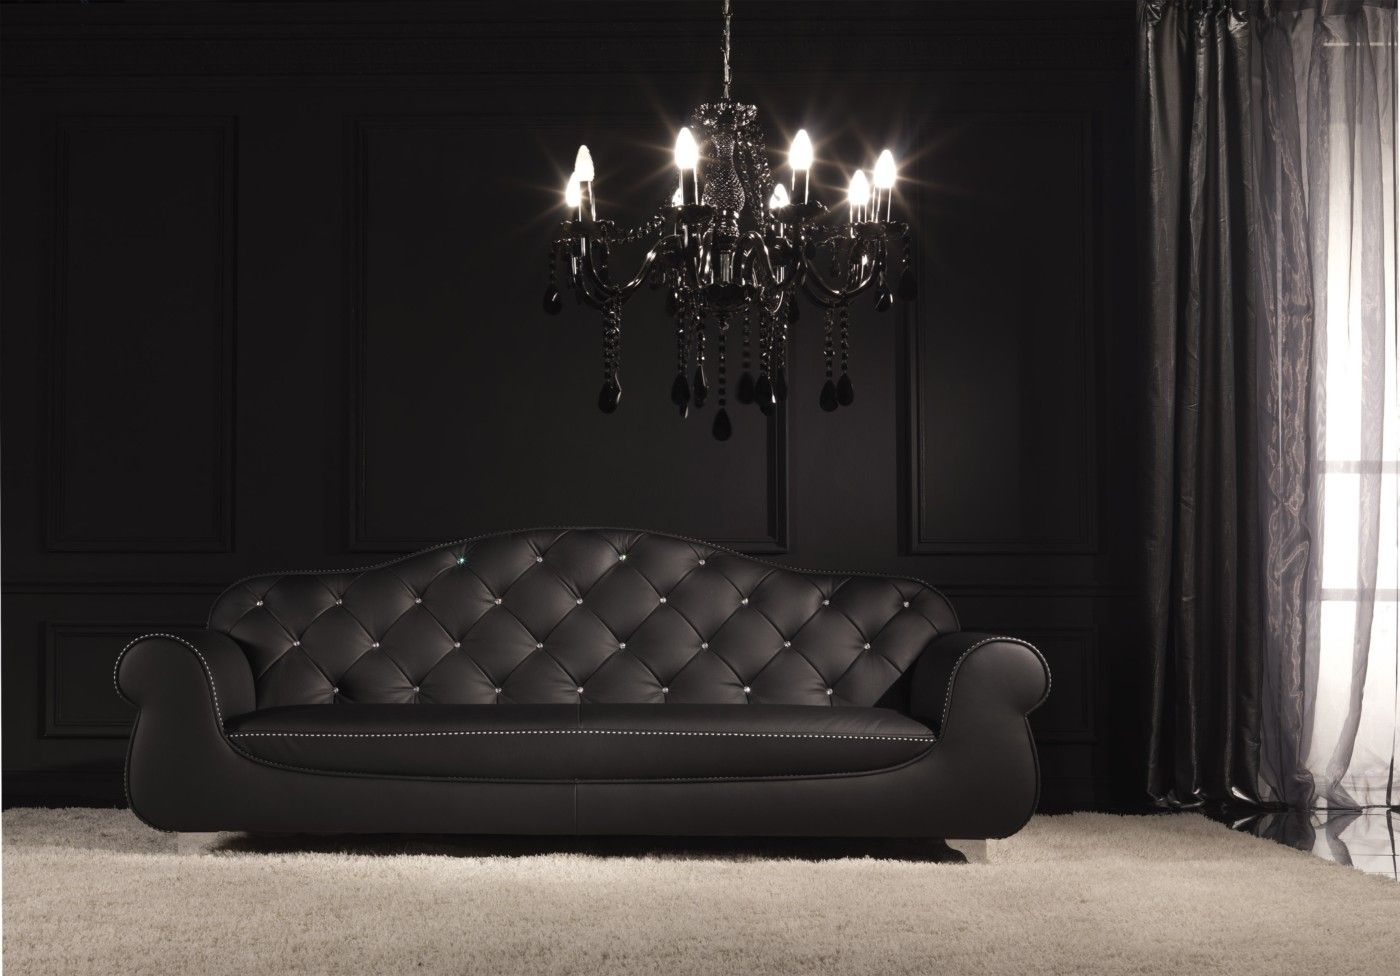 Breeze Carrara Marble Luxury Console Luxury furniture